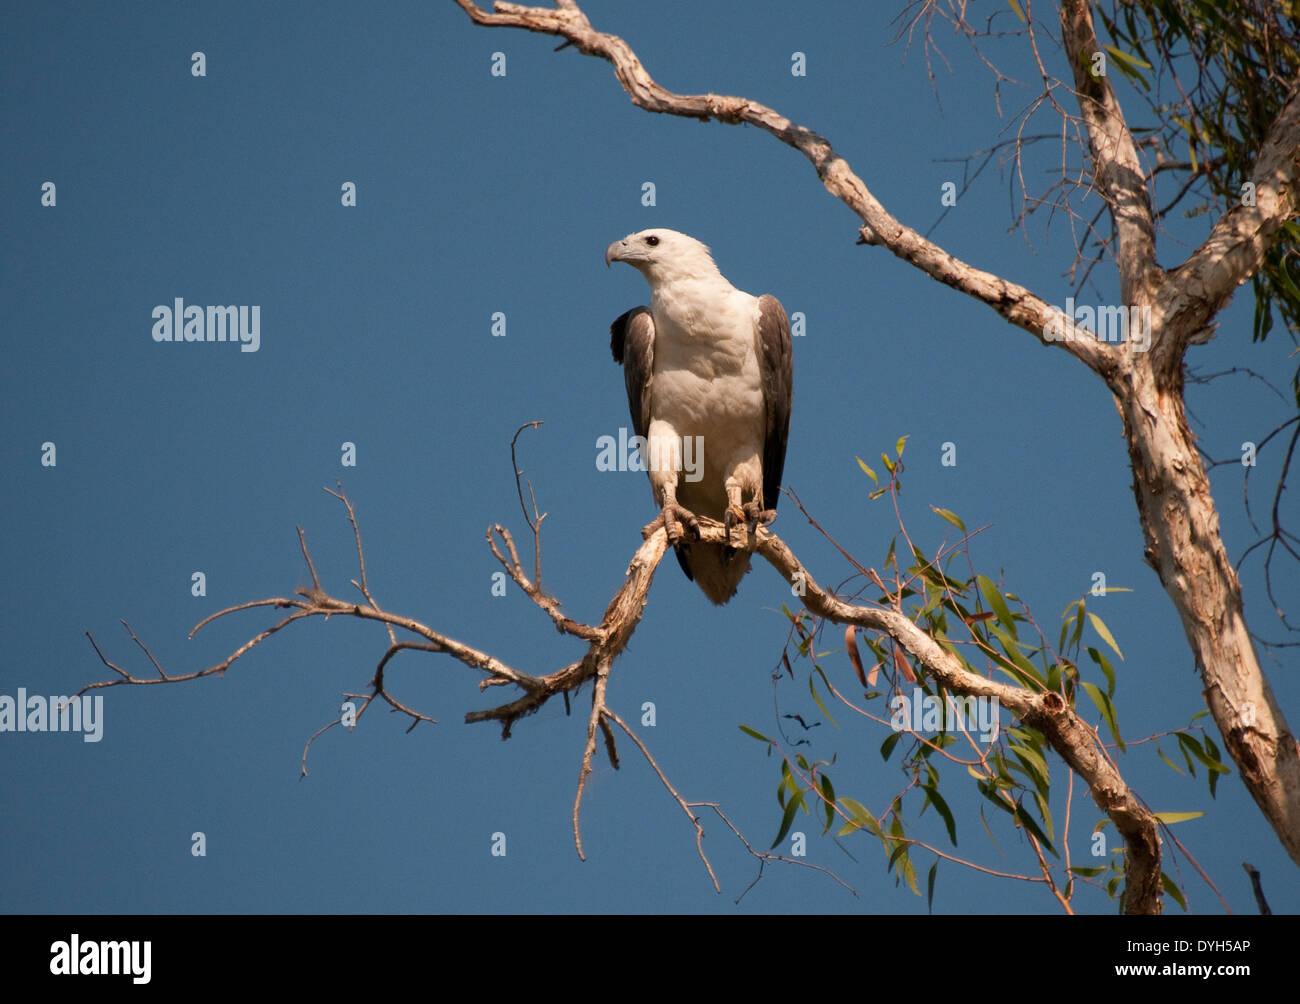 White-bellied Seeadler (Haliaeetus Leucogaster), South Alligator River, Kakadu National Park, Australien Stockfoto